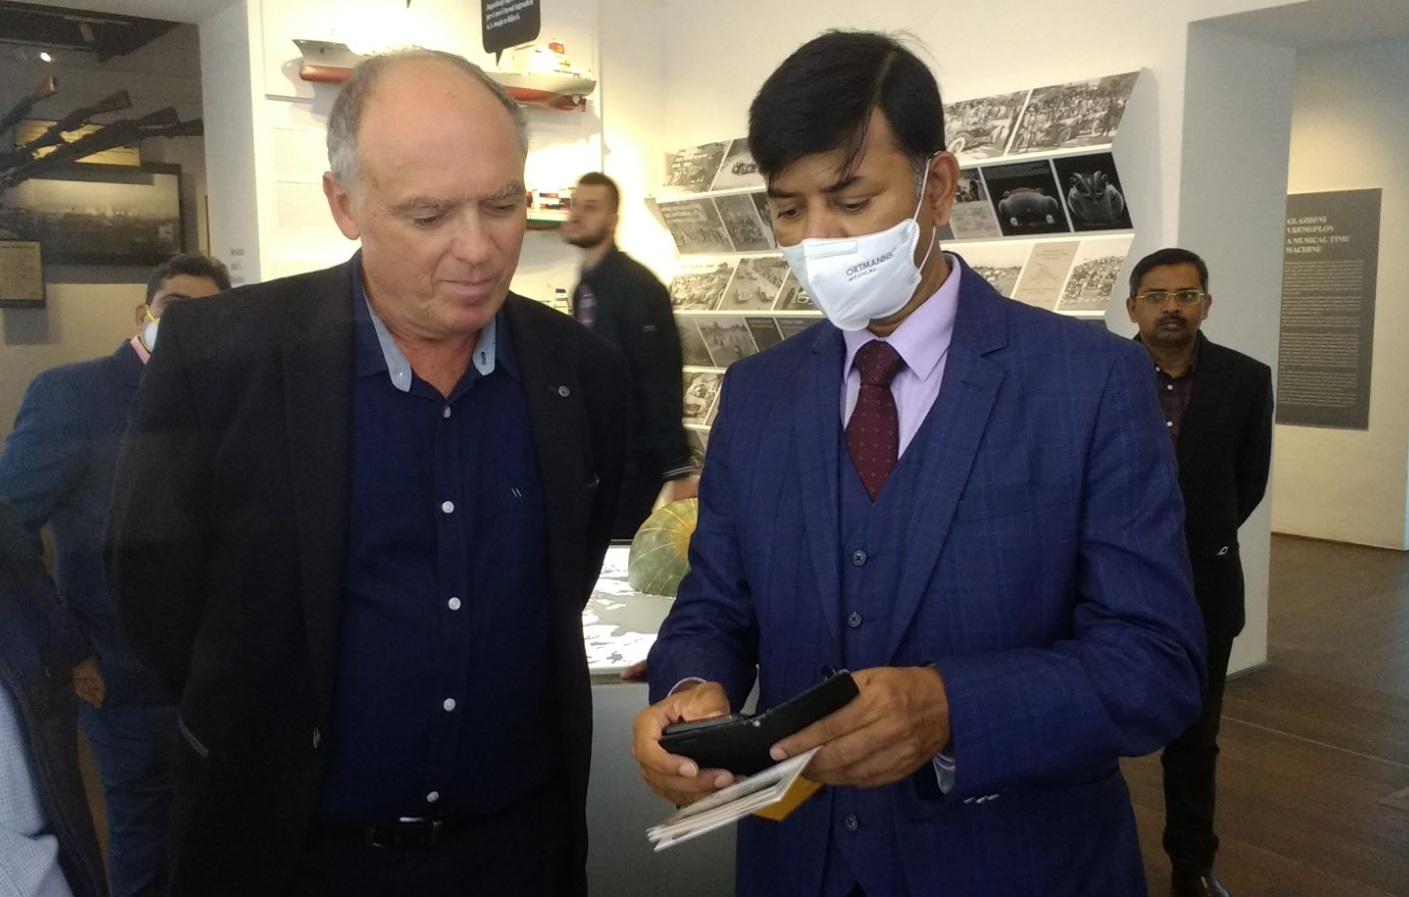 The Indian Ambassador visited the Sugar Palace